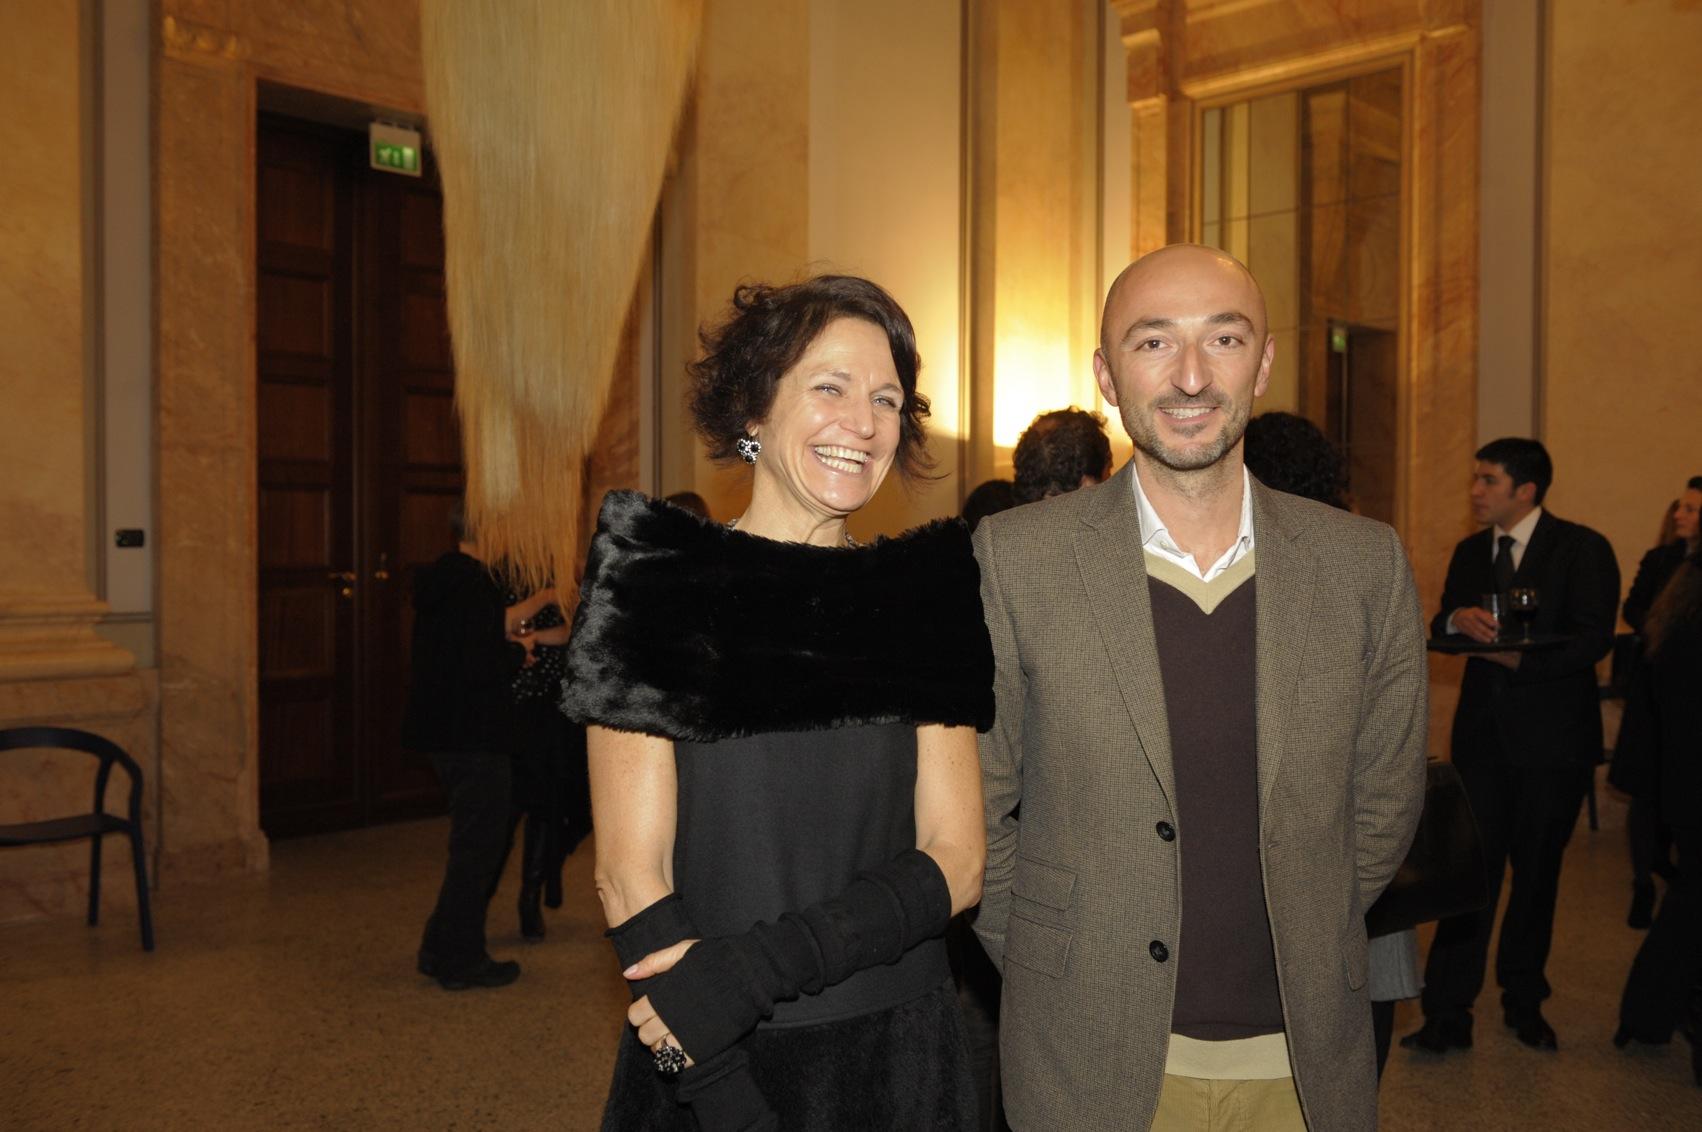 Letizia Ragaglia e Cédric Aurelle, direttore Gallery Weekend Berlin e Kunstmesse abc (foto Jan-Peter Nüsken)